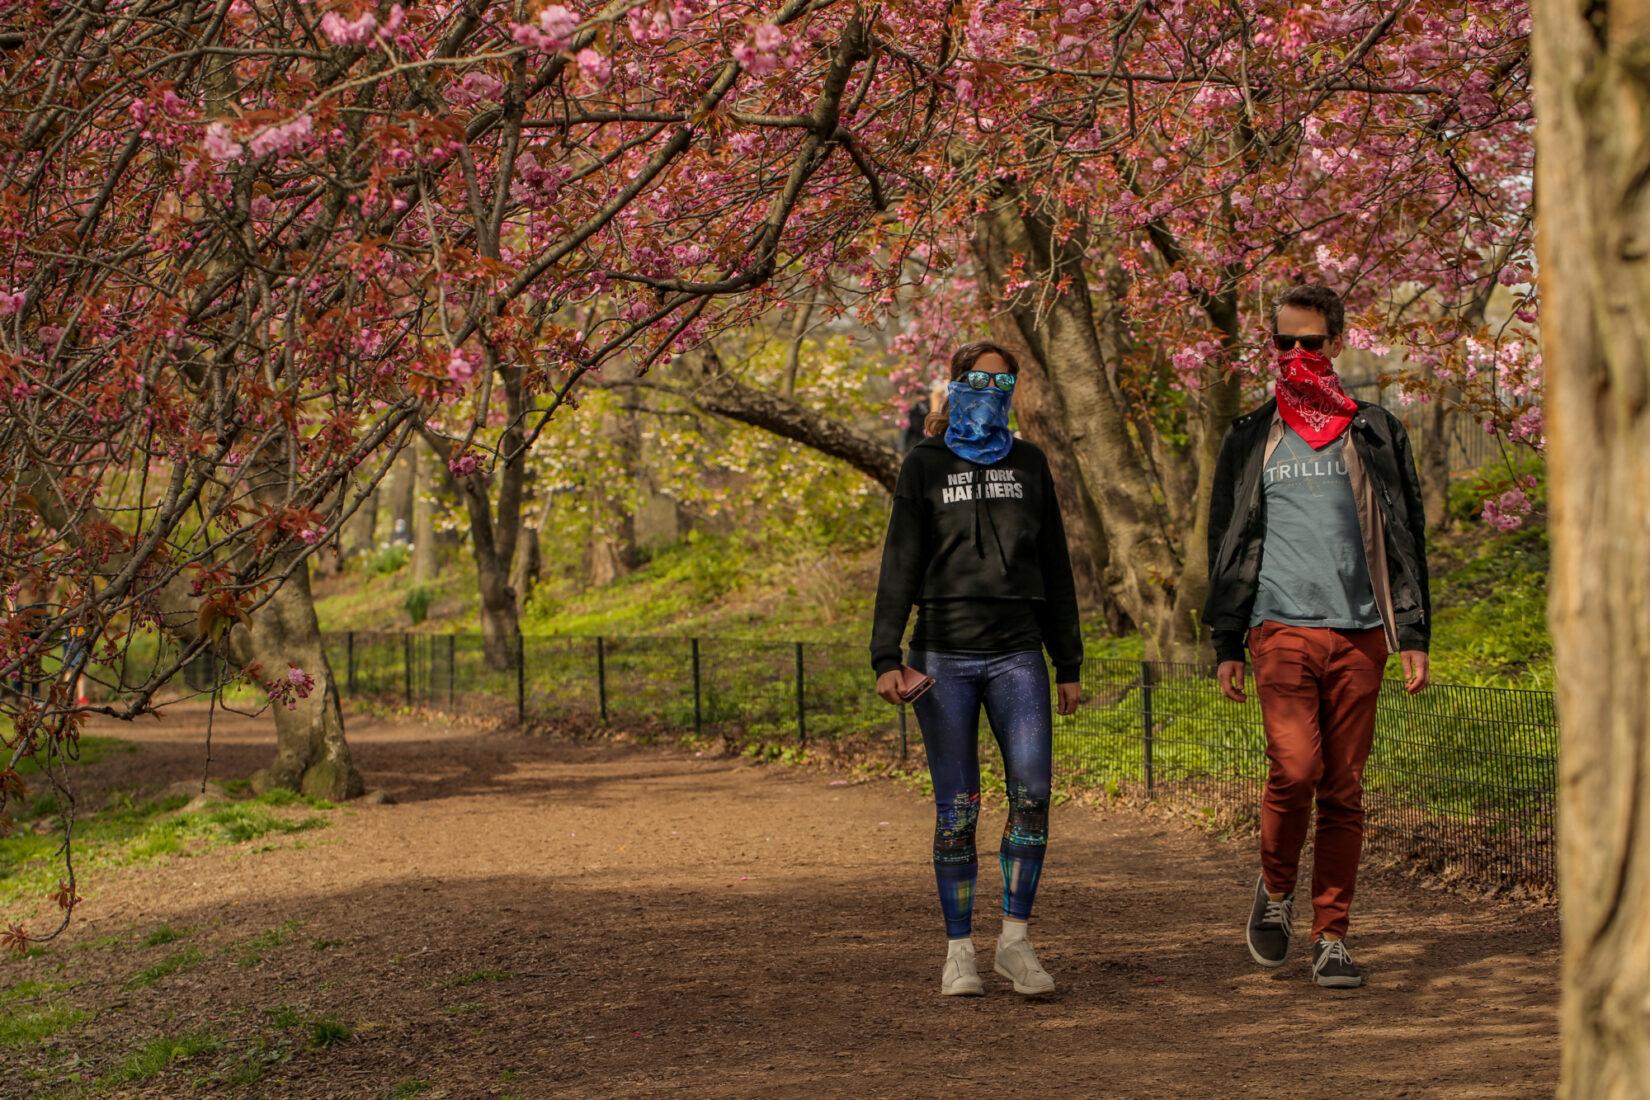 Park-goers, masked, alone on a stroll